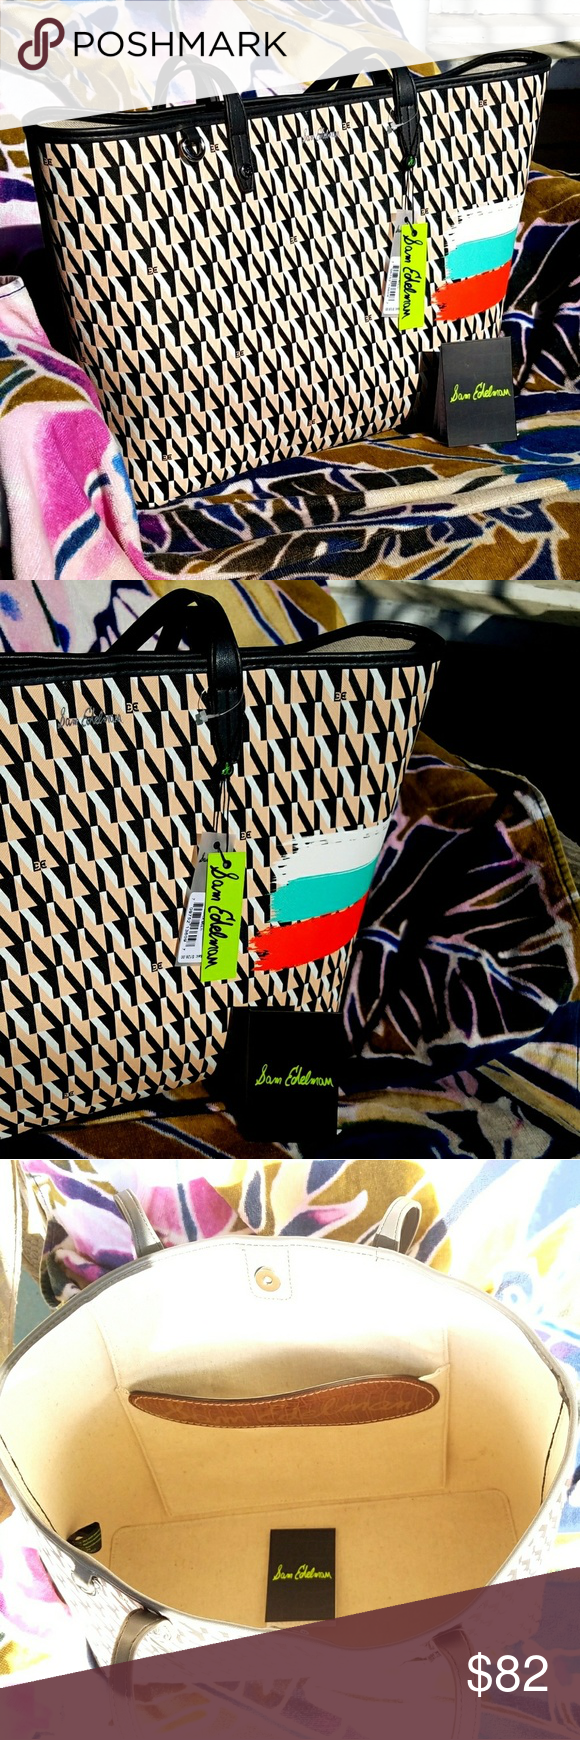 ccf46028c2 Sam Edelman Isalyn Signature Summer Tote Bag Dual top handles